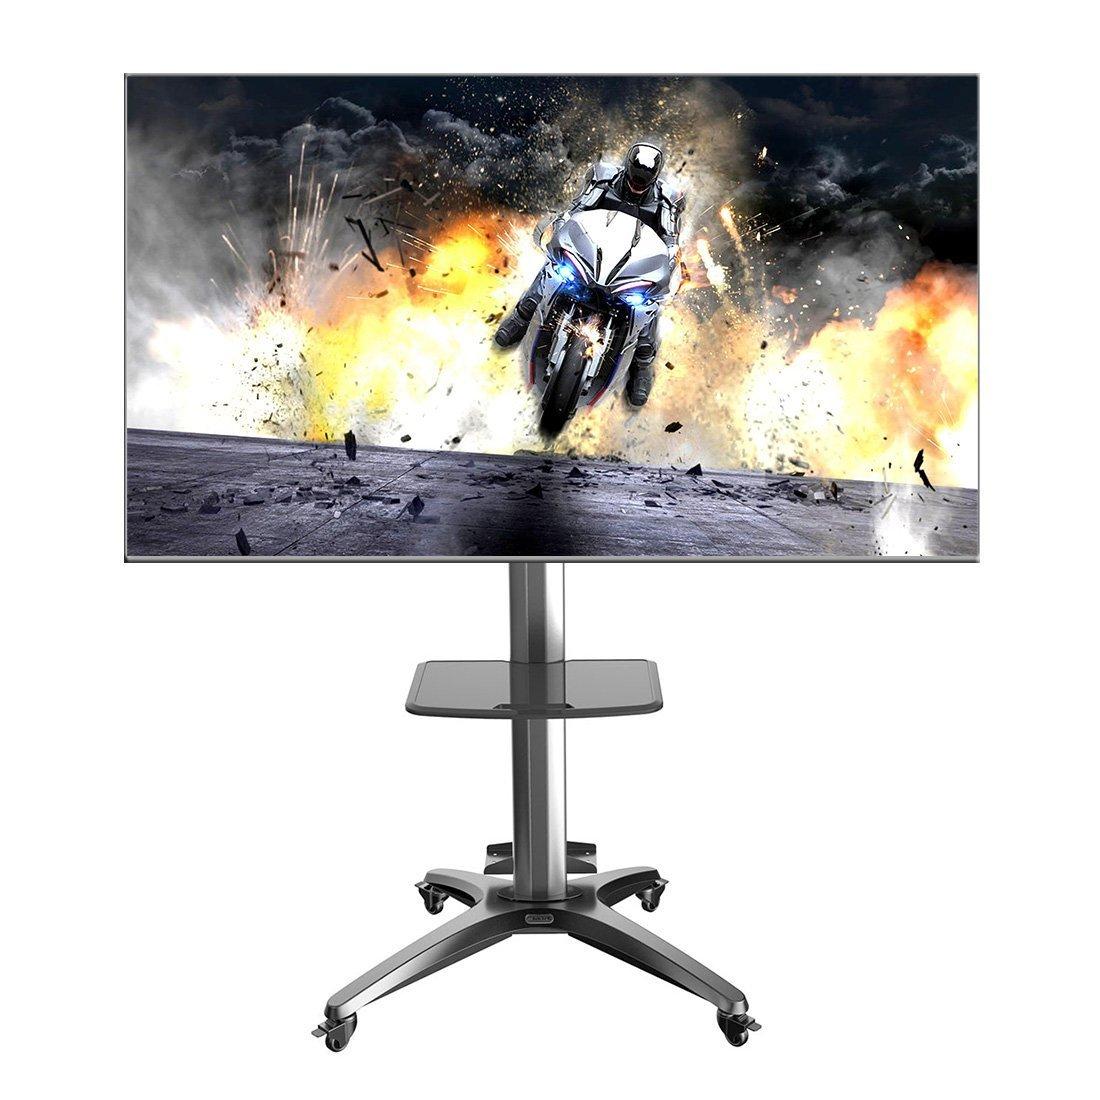 "Fleximounts C04 Adjustable Sturdy Heavy Duty Universal Rolling Mobile Tv Cart for 32''-55'' Flat Screen Monitors Stand with Tilting Tv Bracket & Plastic DVD Shelf(C04 B 32""-55"")"